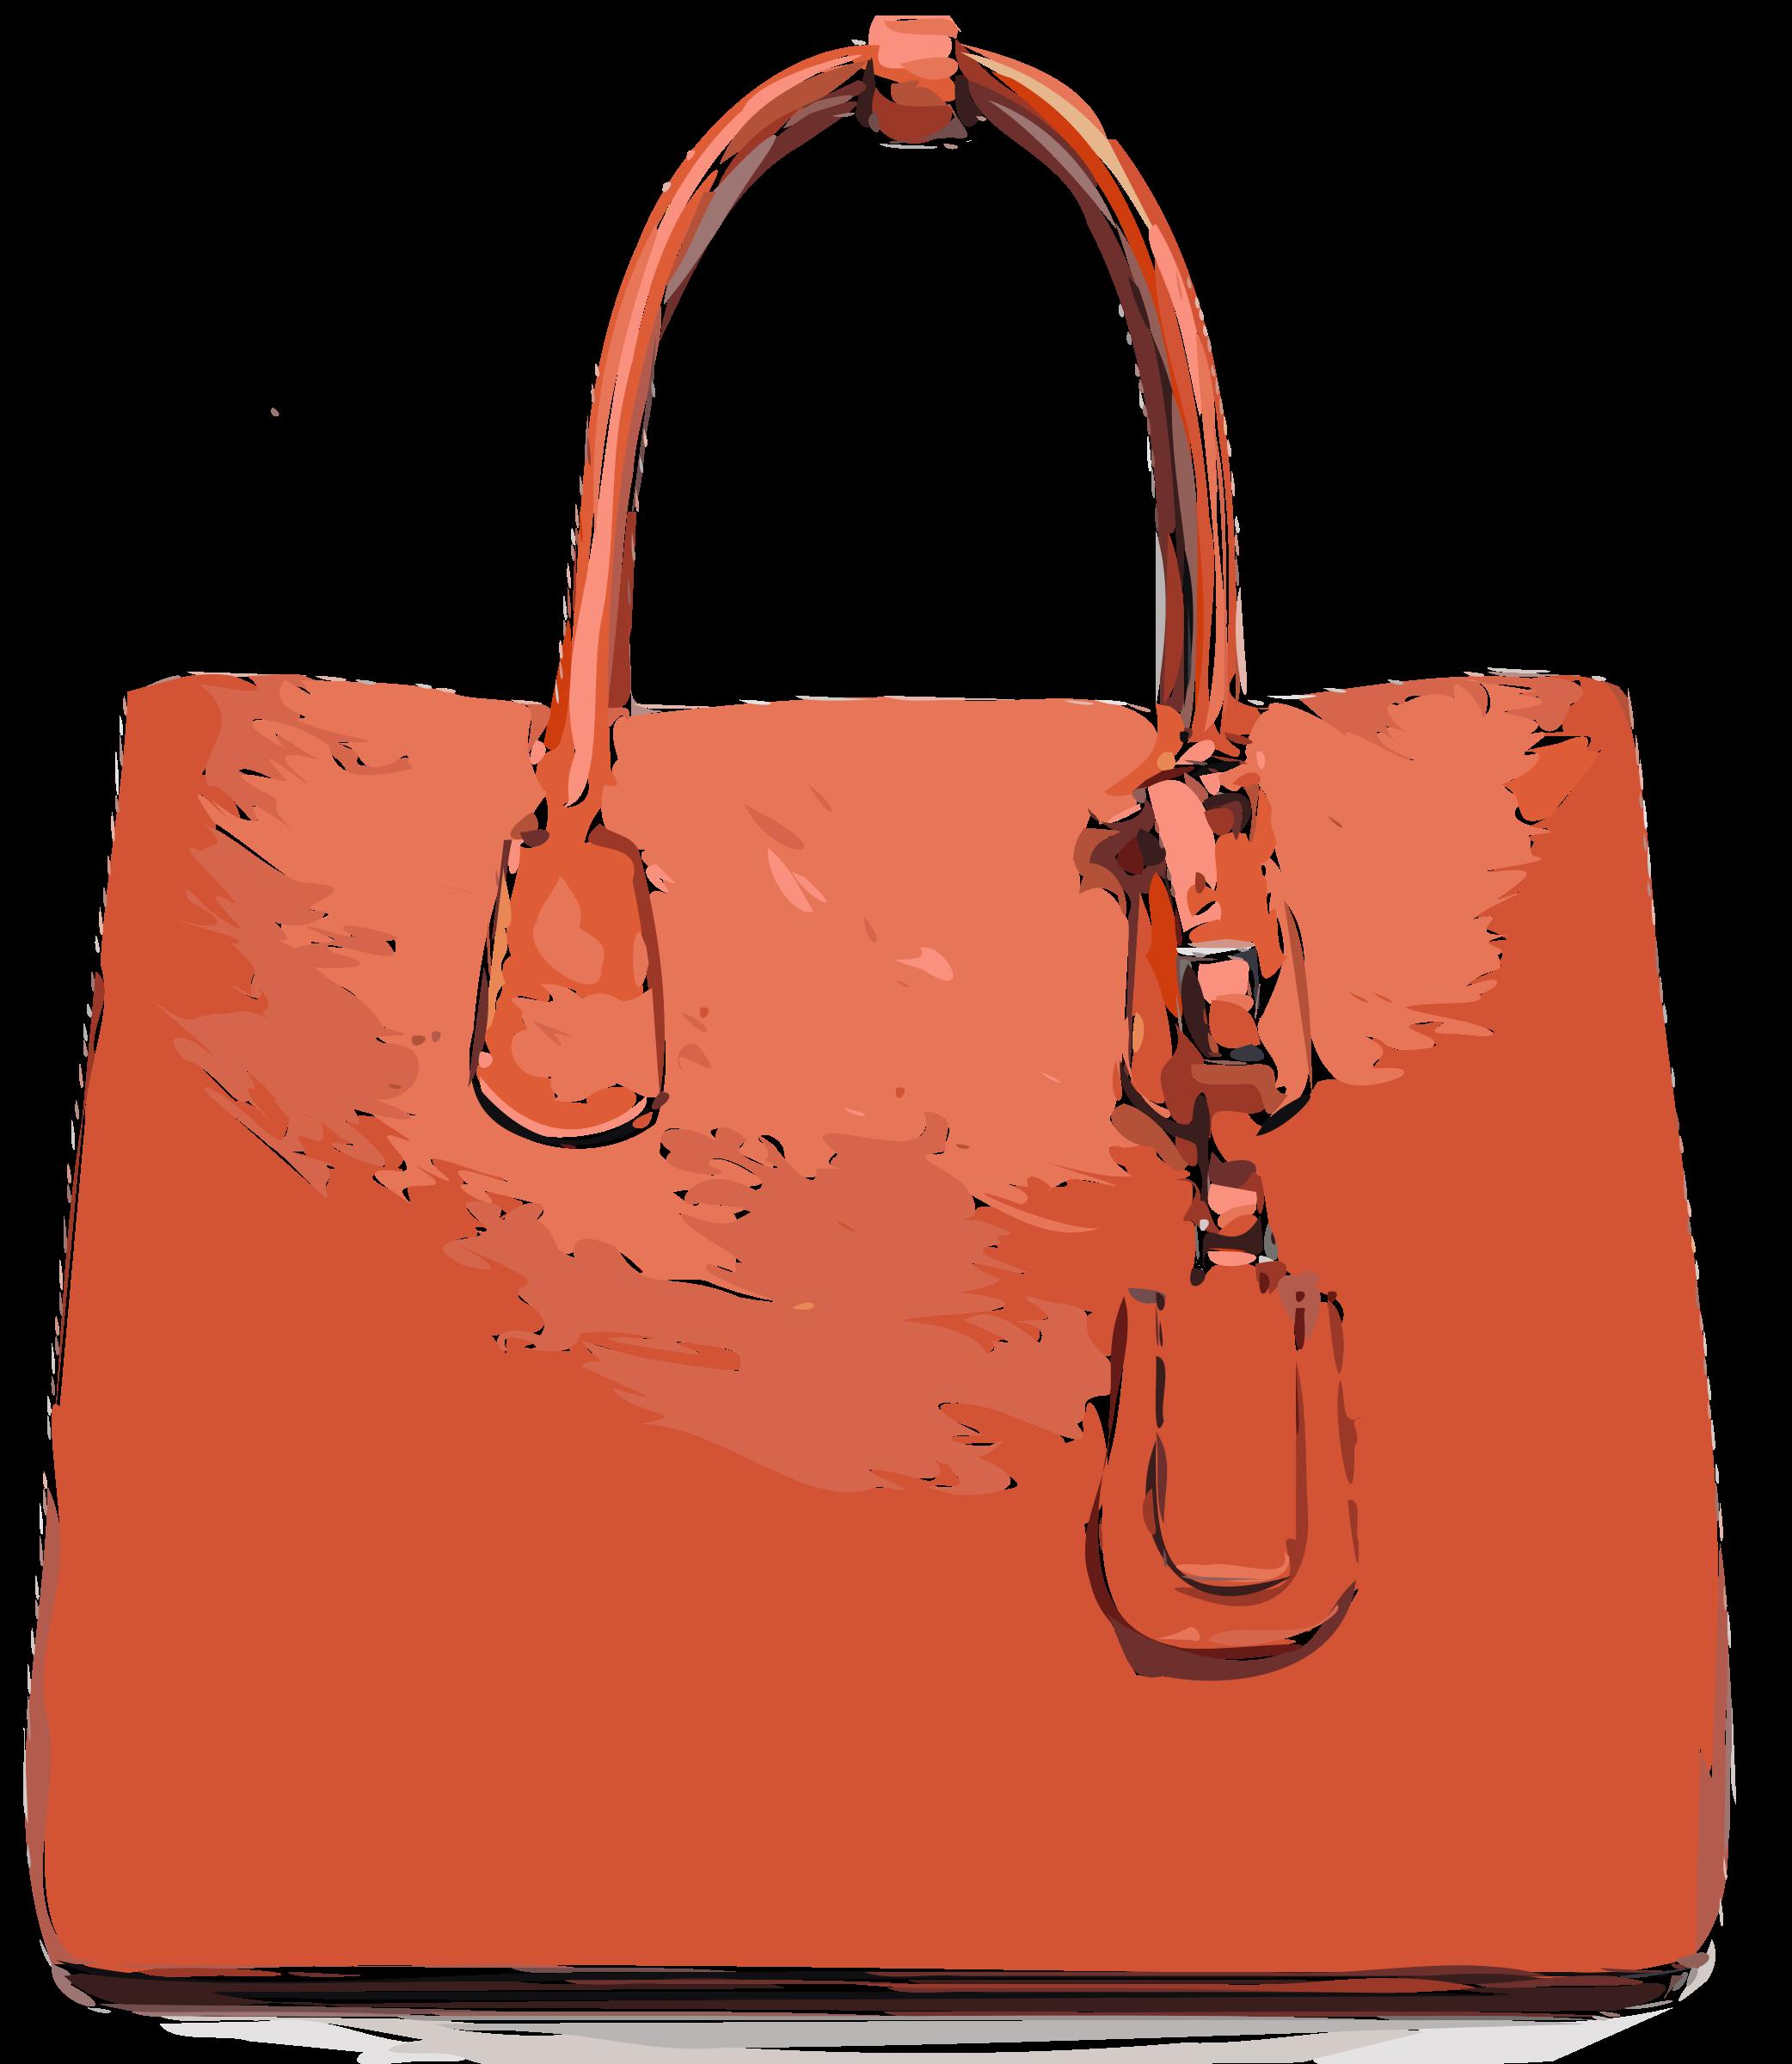 Flat leather bag big. Luggage clipart orange